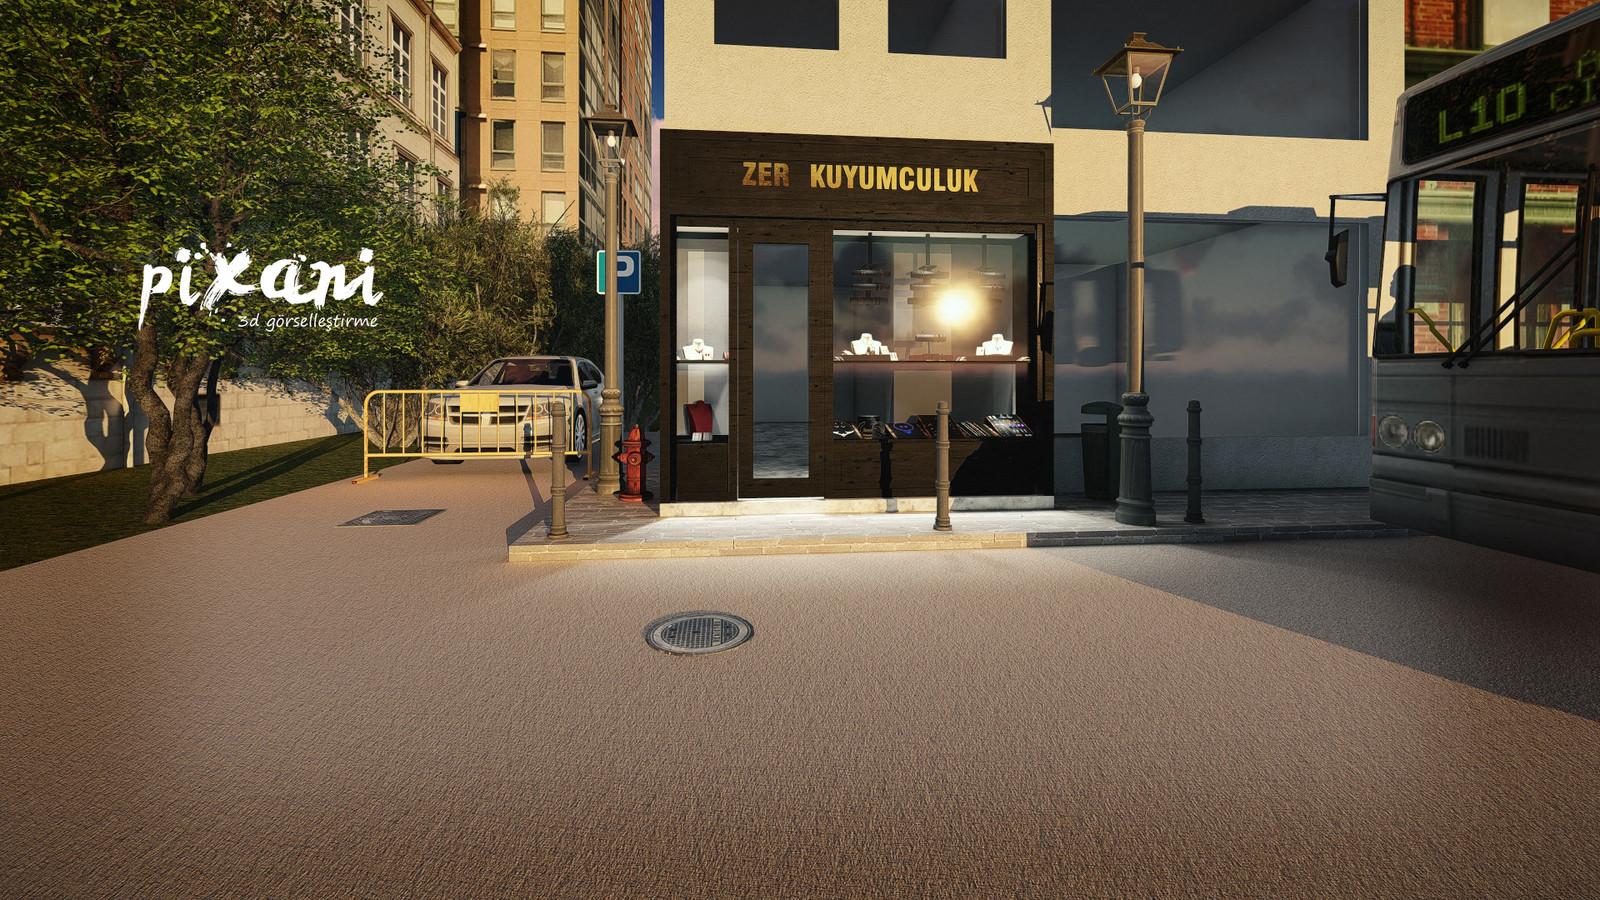 ZER Jewelry Store exterior Architect & CG Artist: Serdar Çakmak